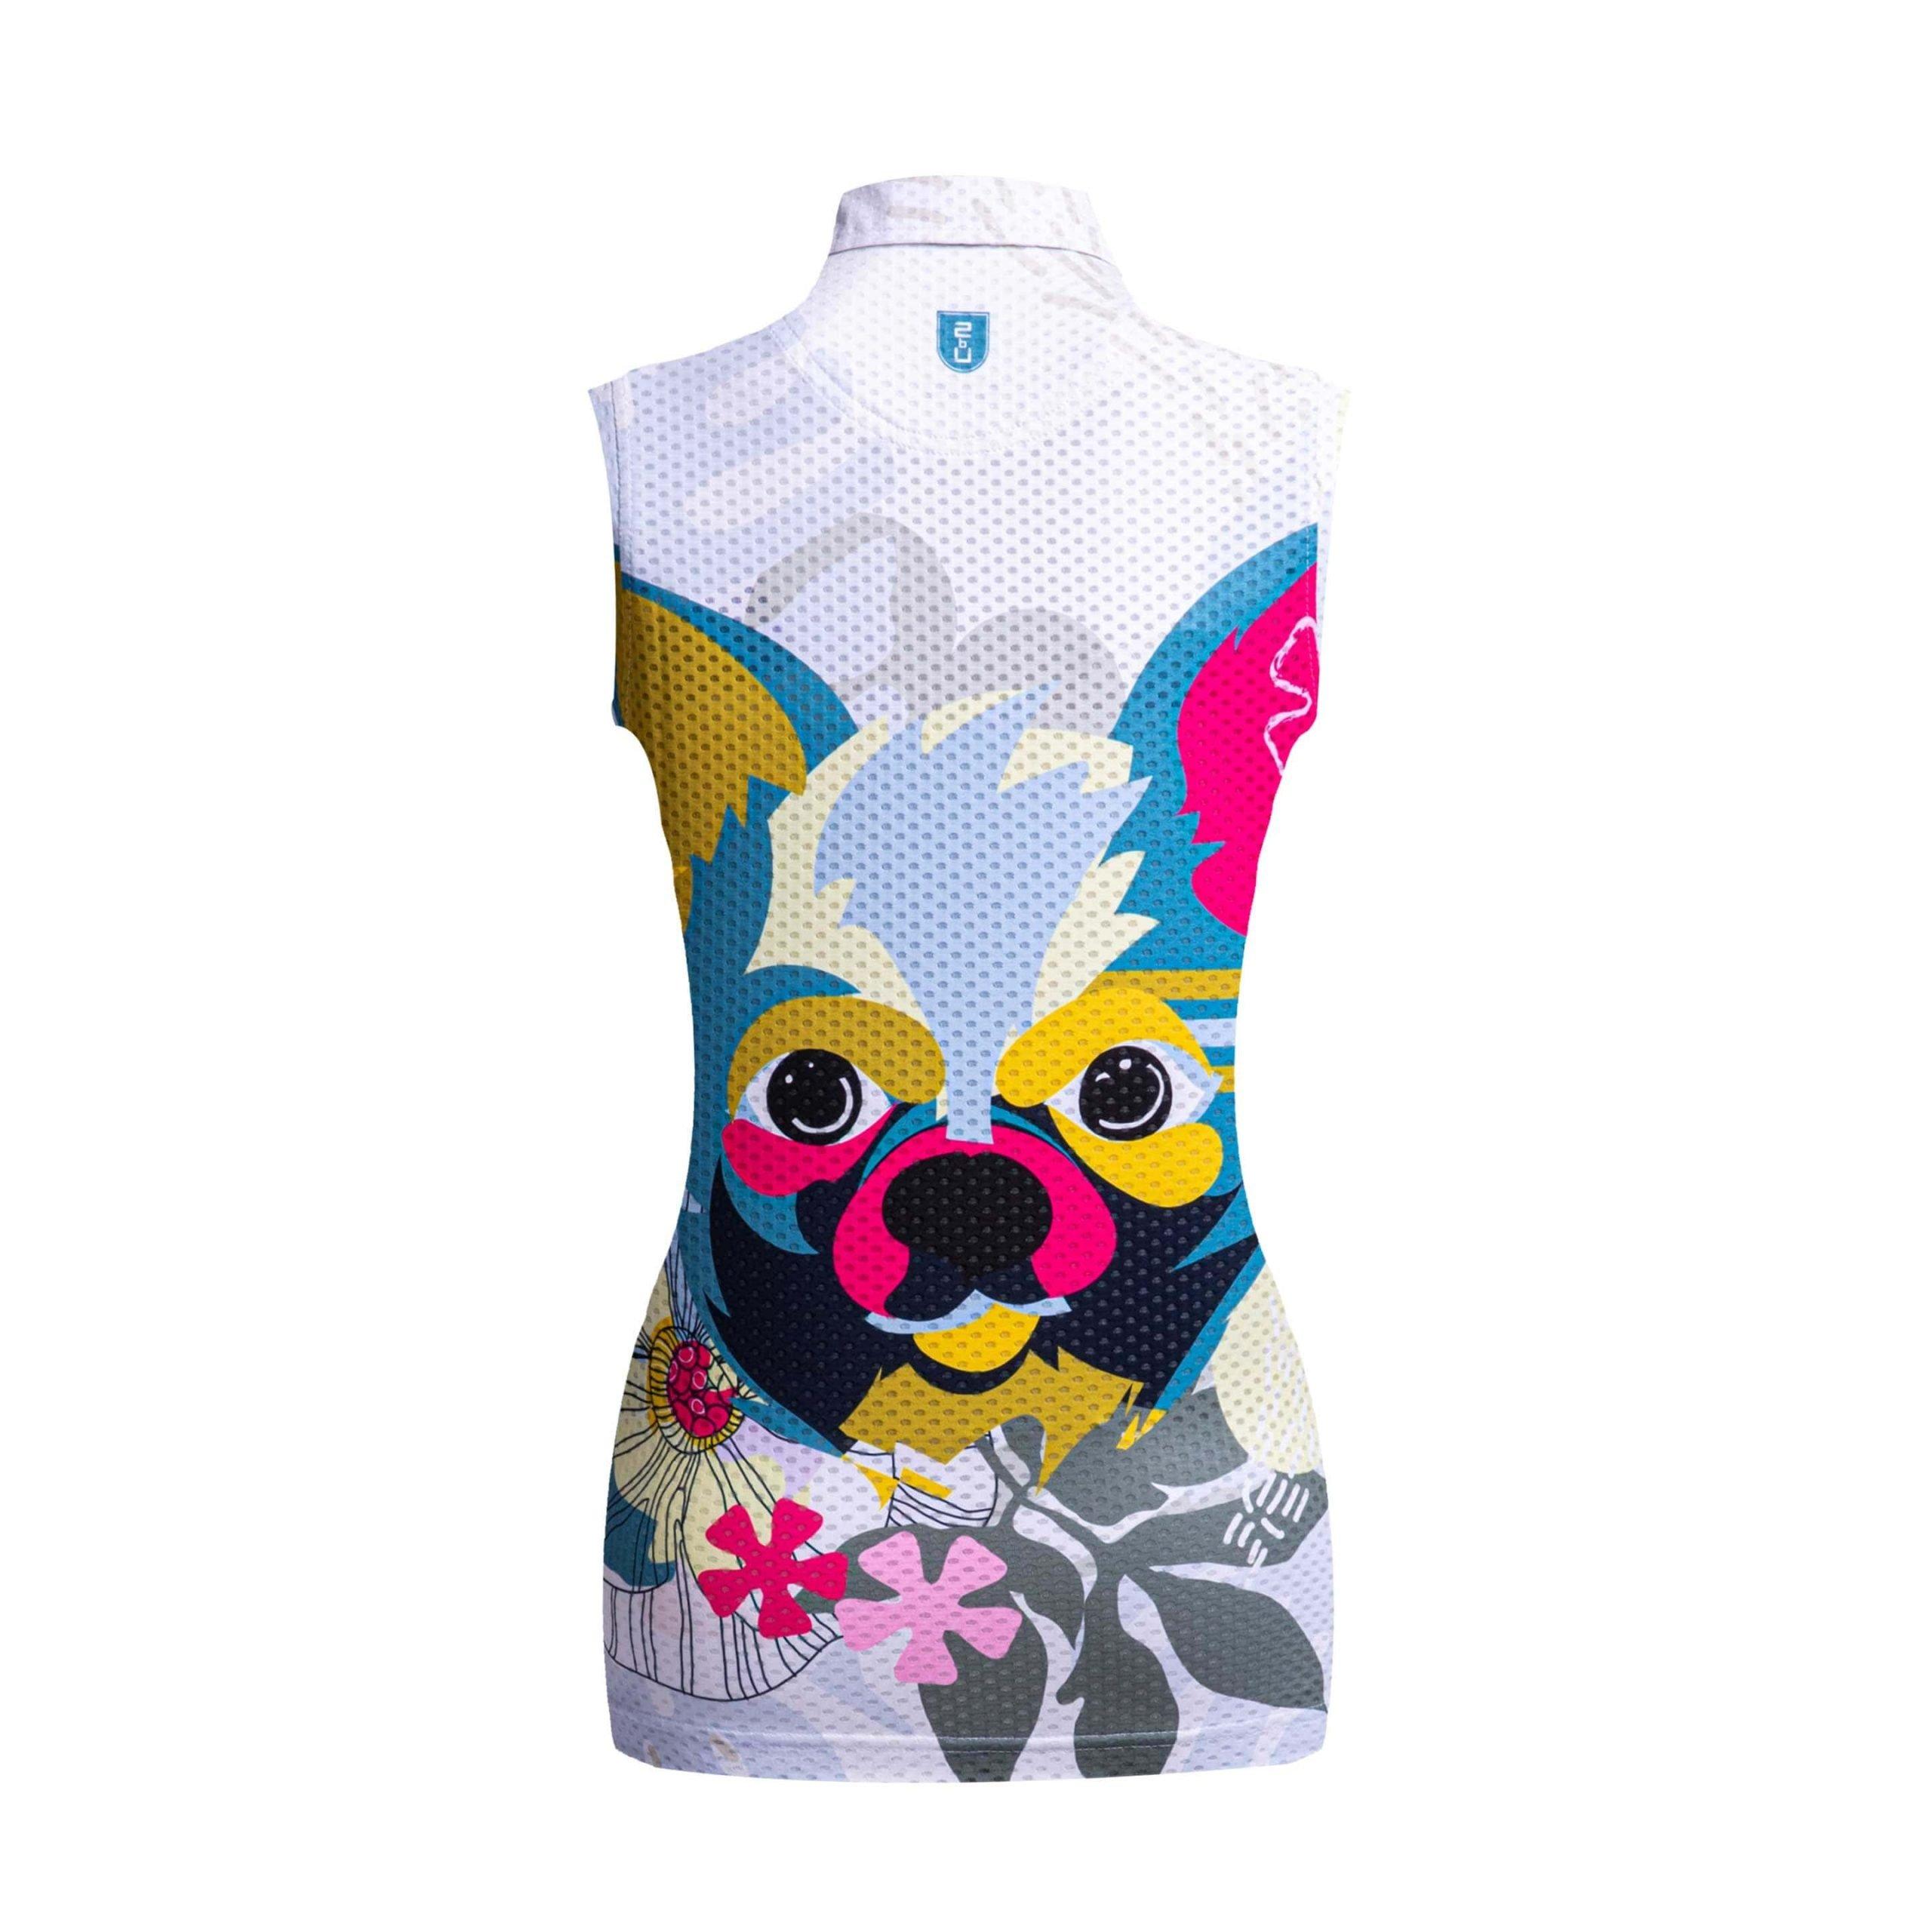 Golf shirt - Chihuahua (sleeveless)